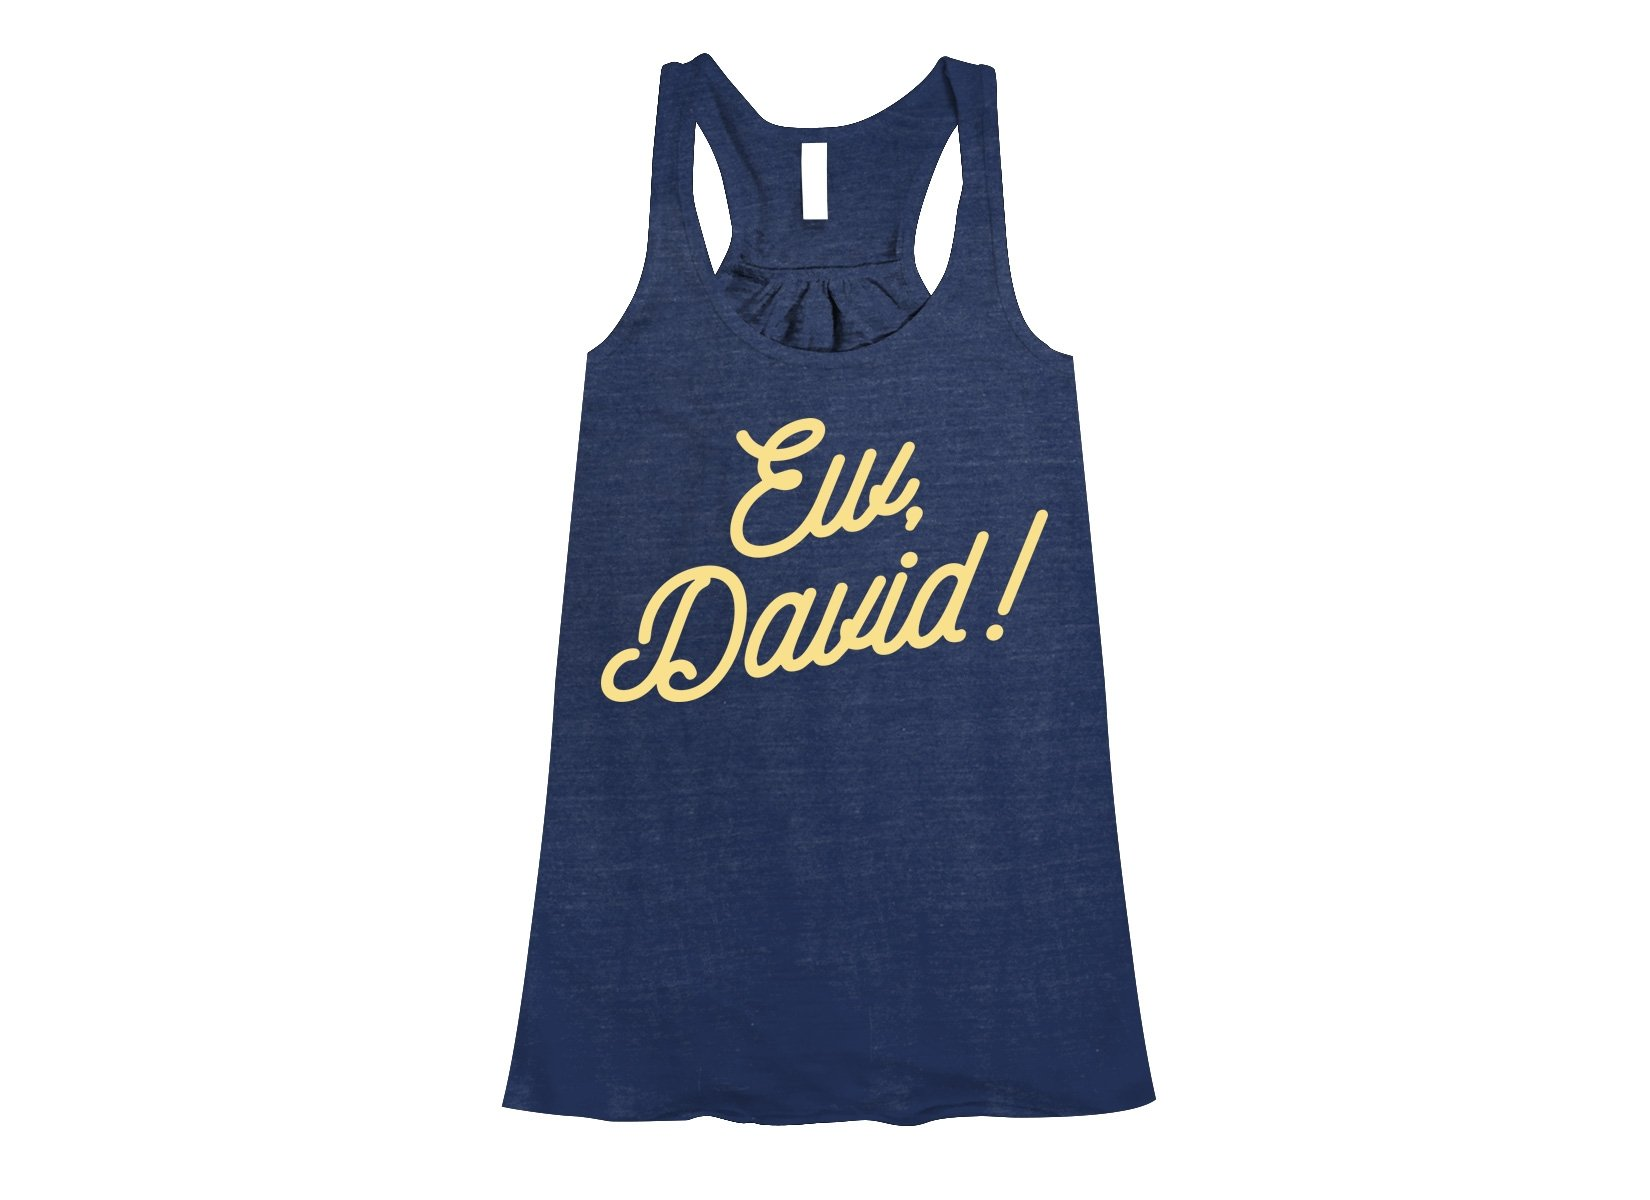 Ew, David! on Womens Tanks T-Shirt